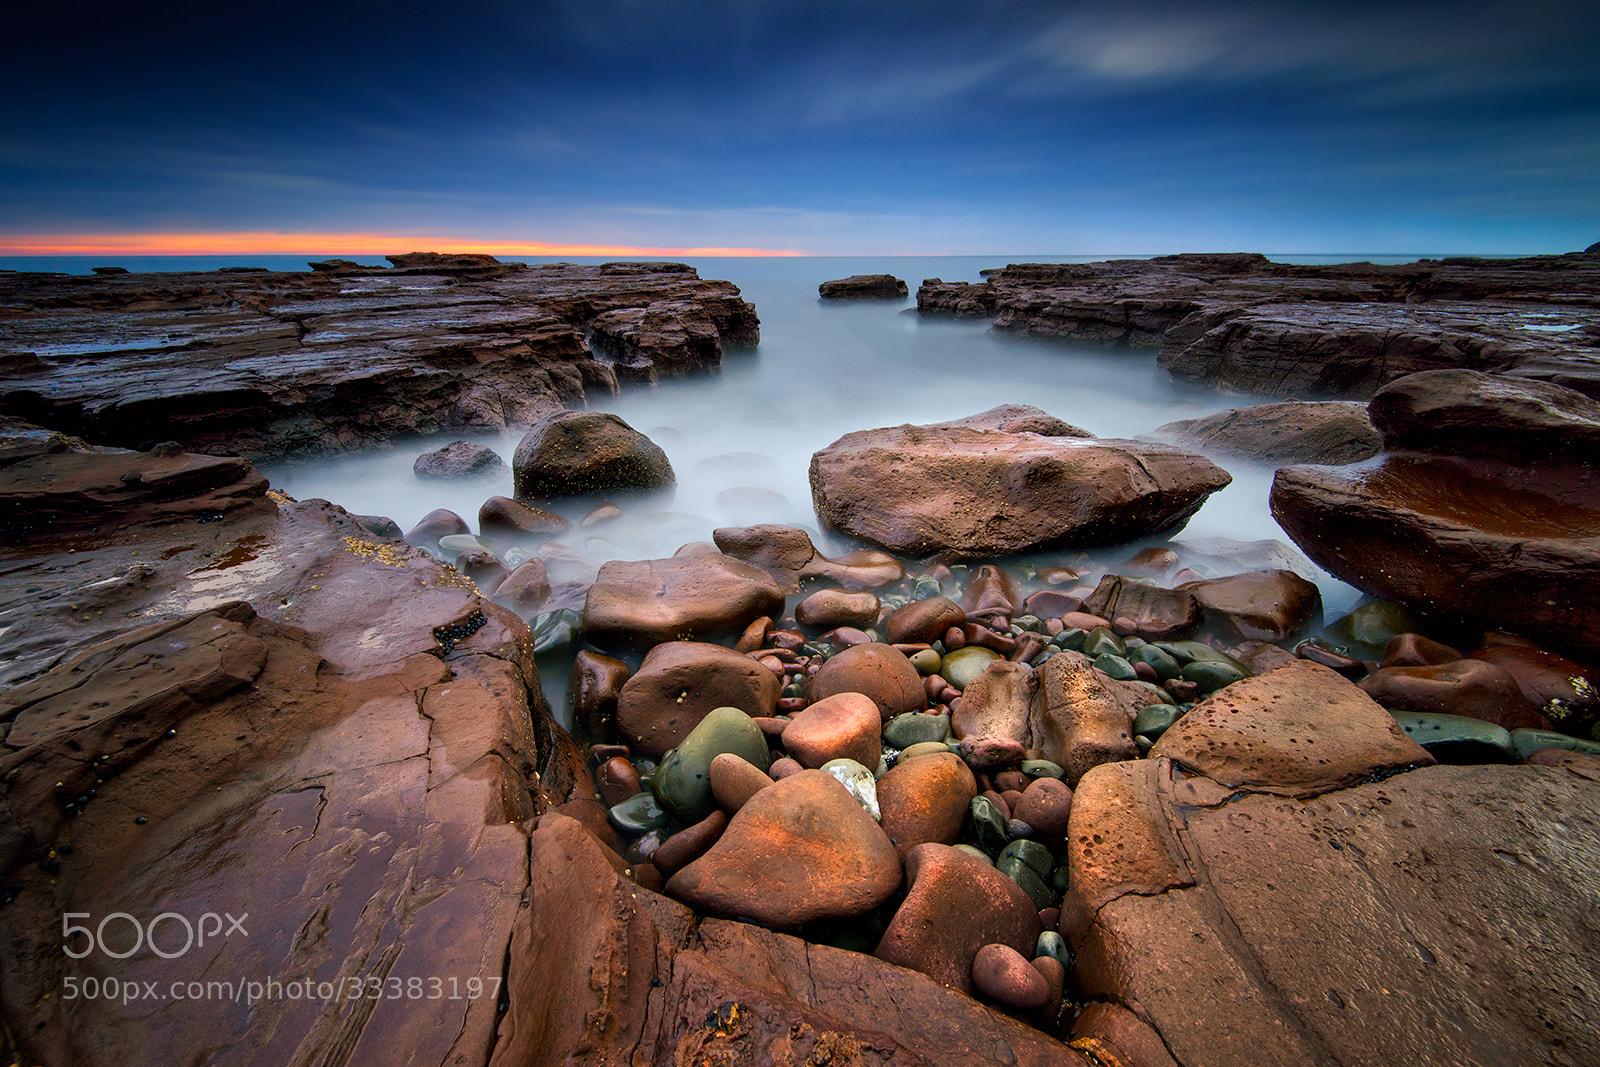 Photograph Rocky rocks by Goff Kitsawad on 500px